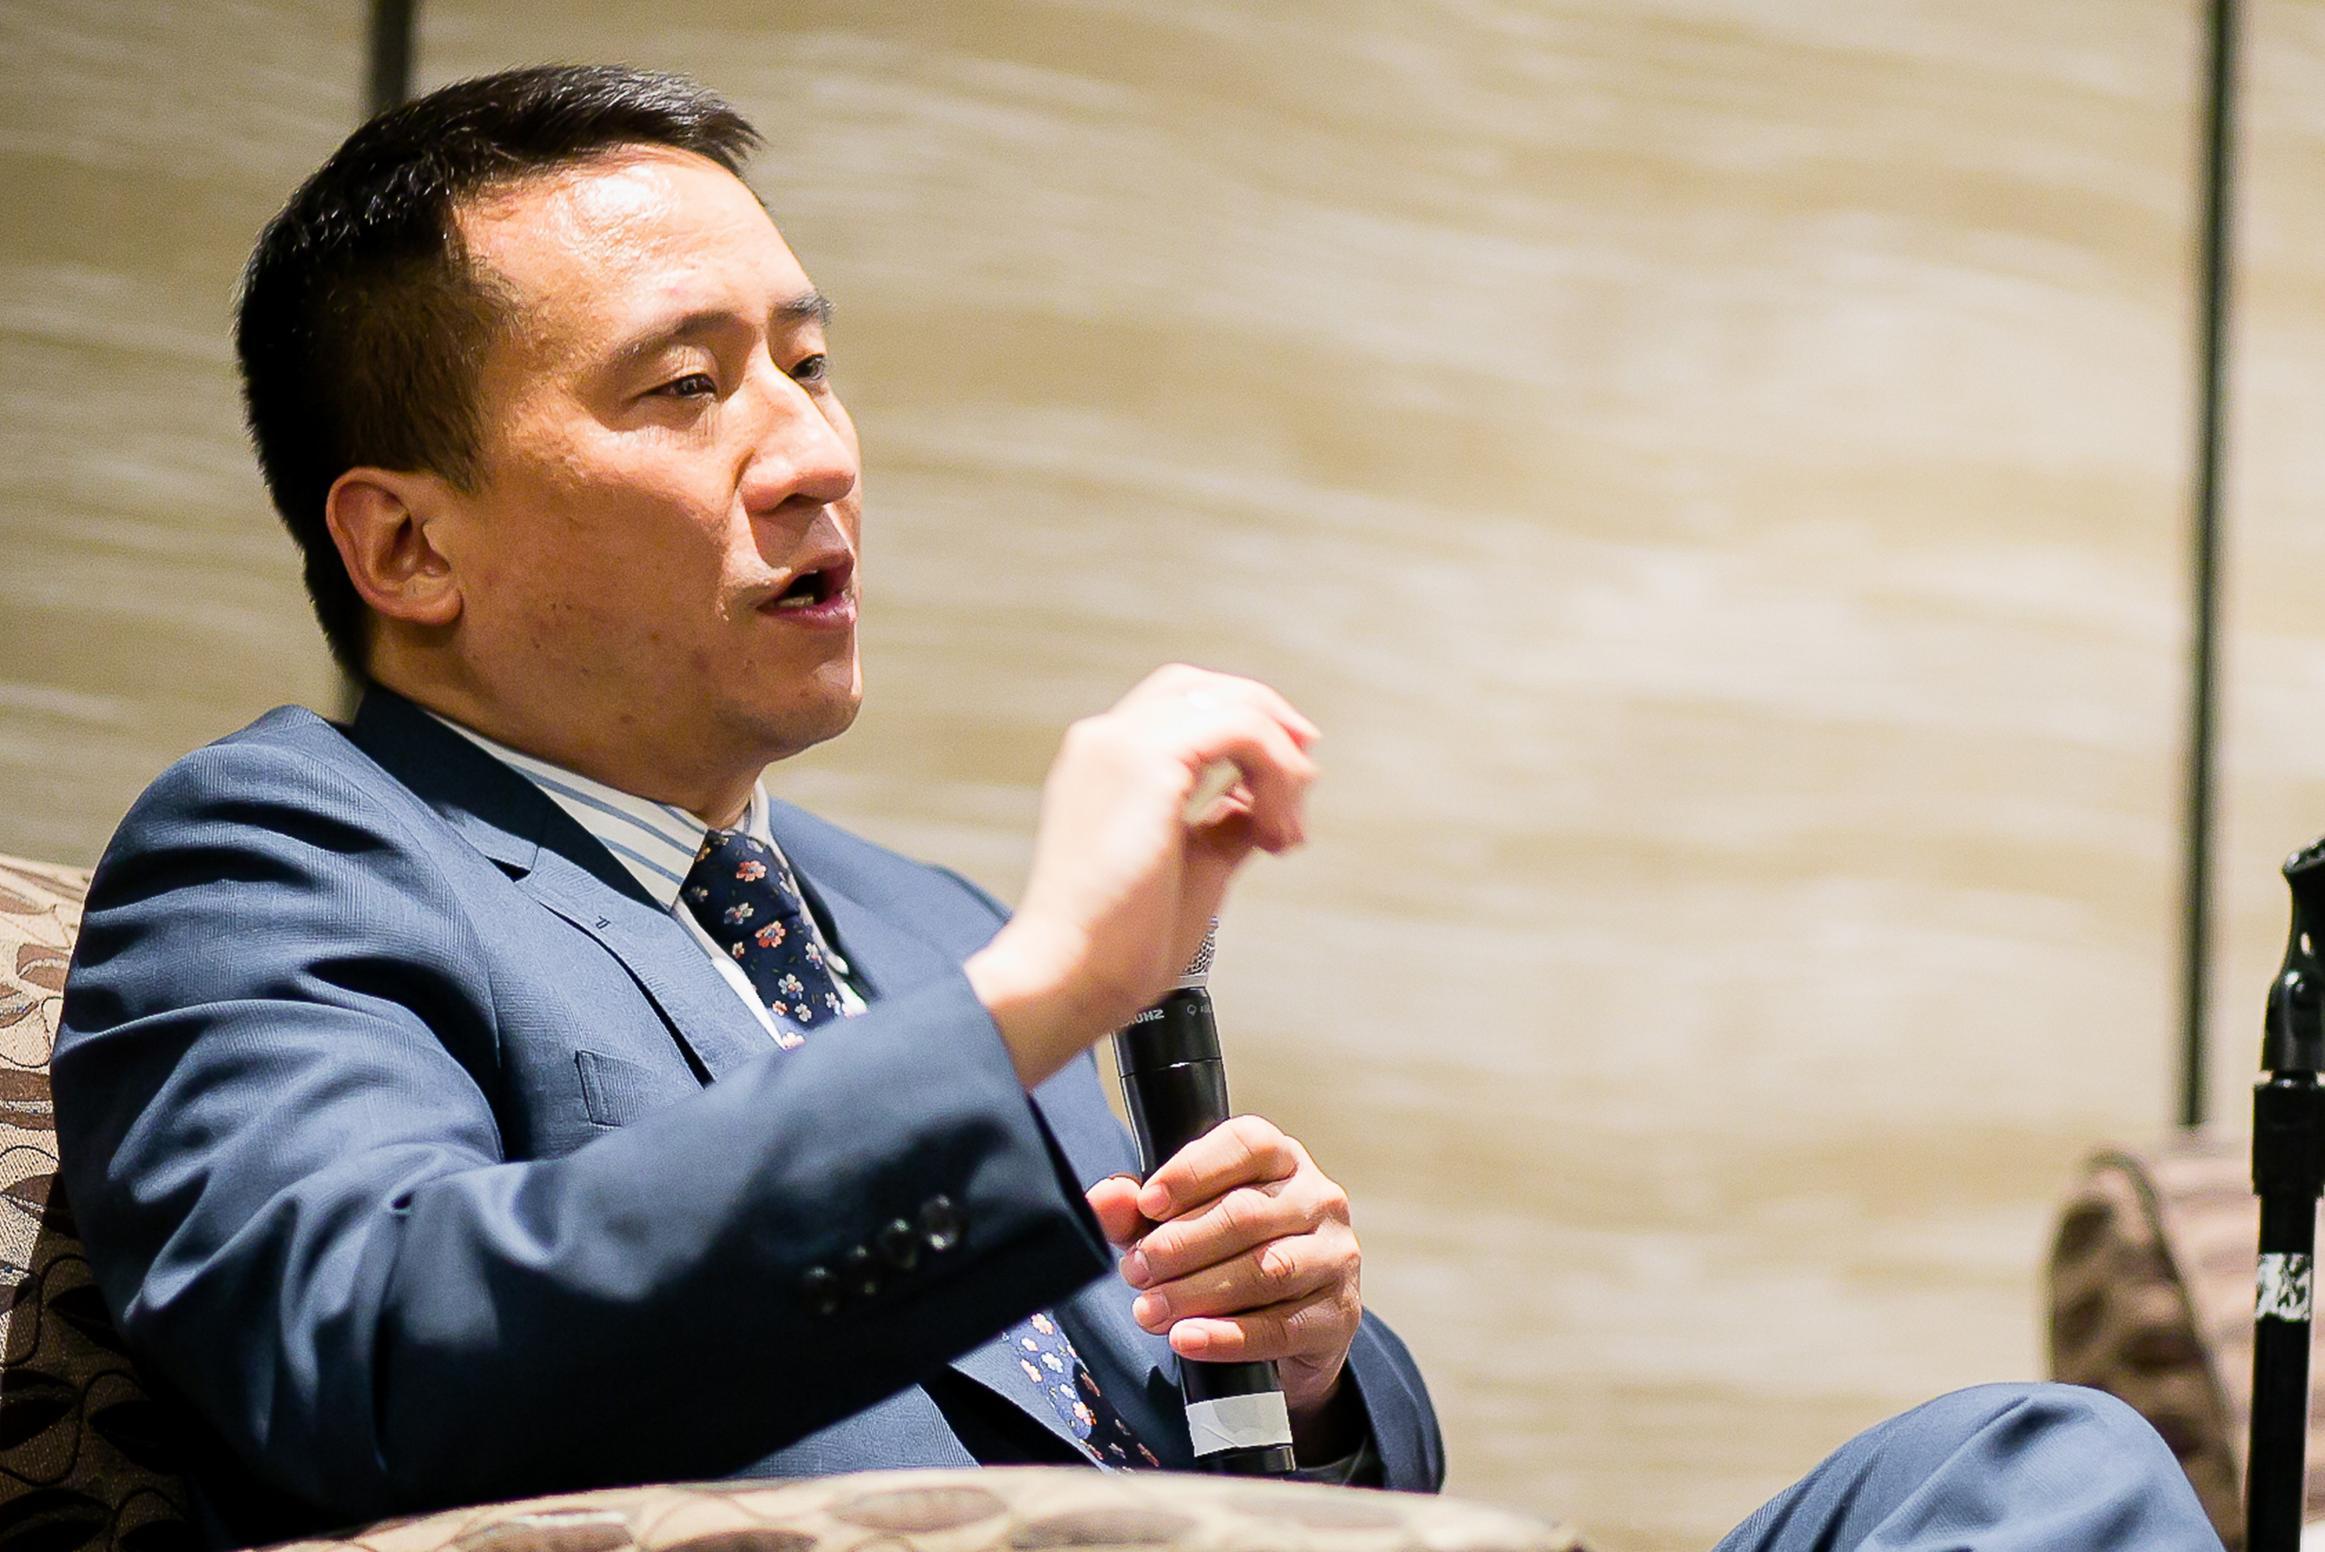 Jason Wu sitting in a chair talking